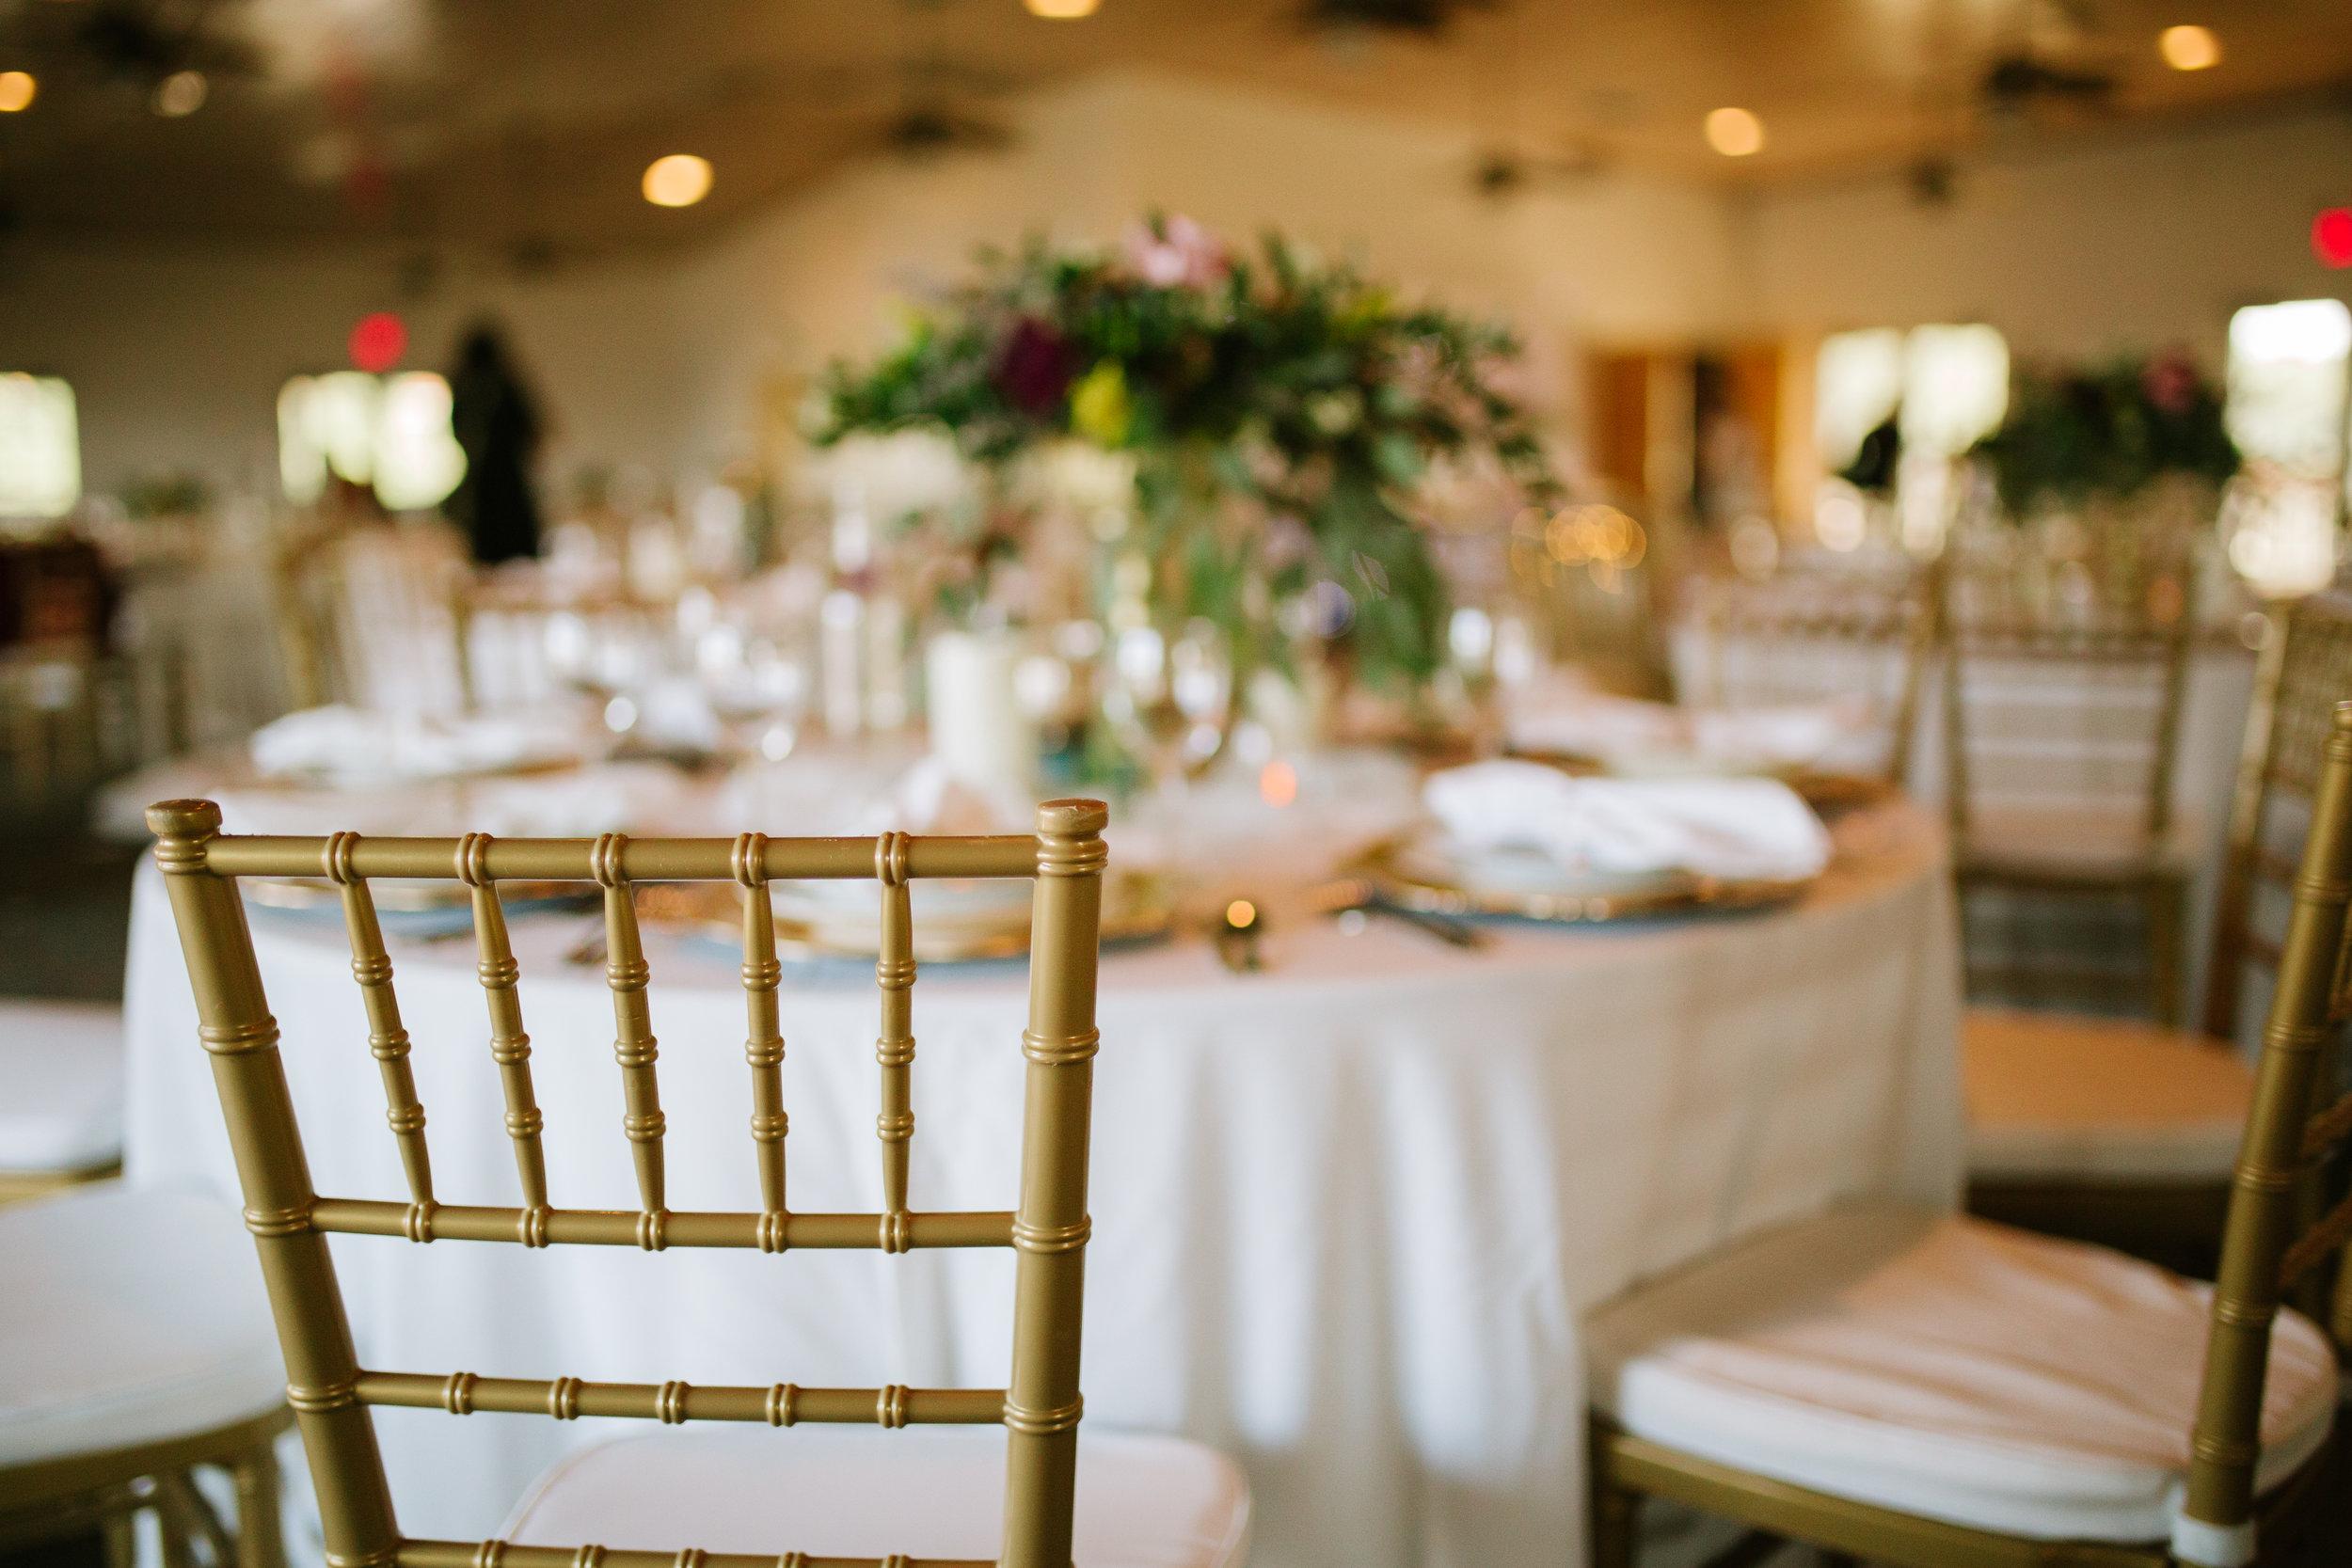 2017.05.23 Barbara and Mauricio Sales Port St Lucie Wedding (108 of 772).jpg